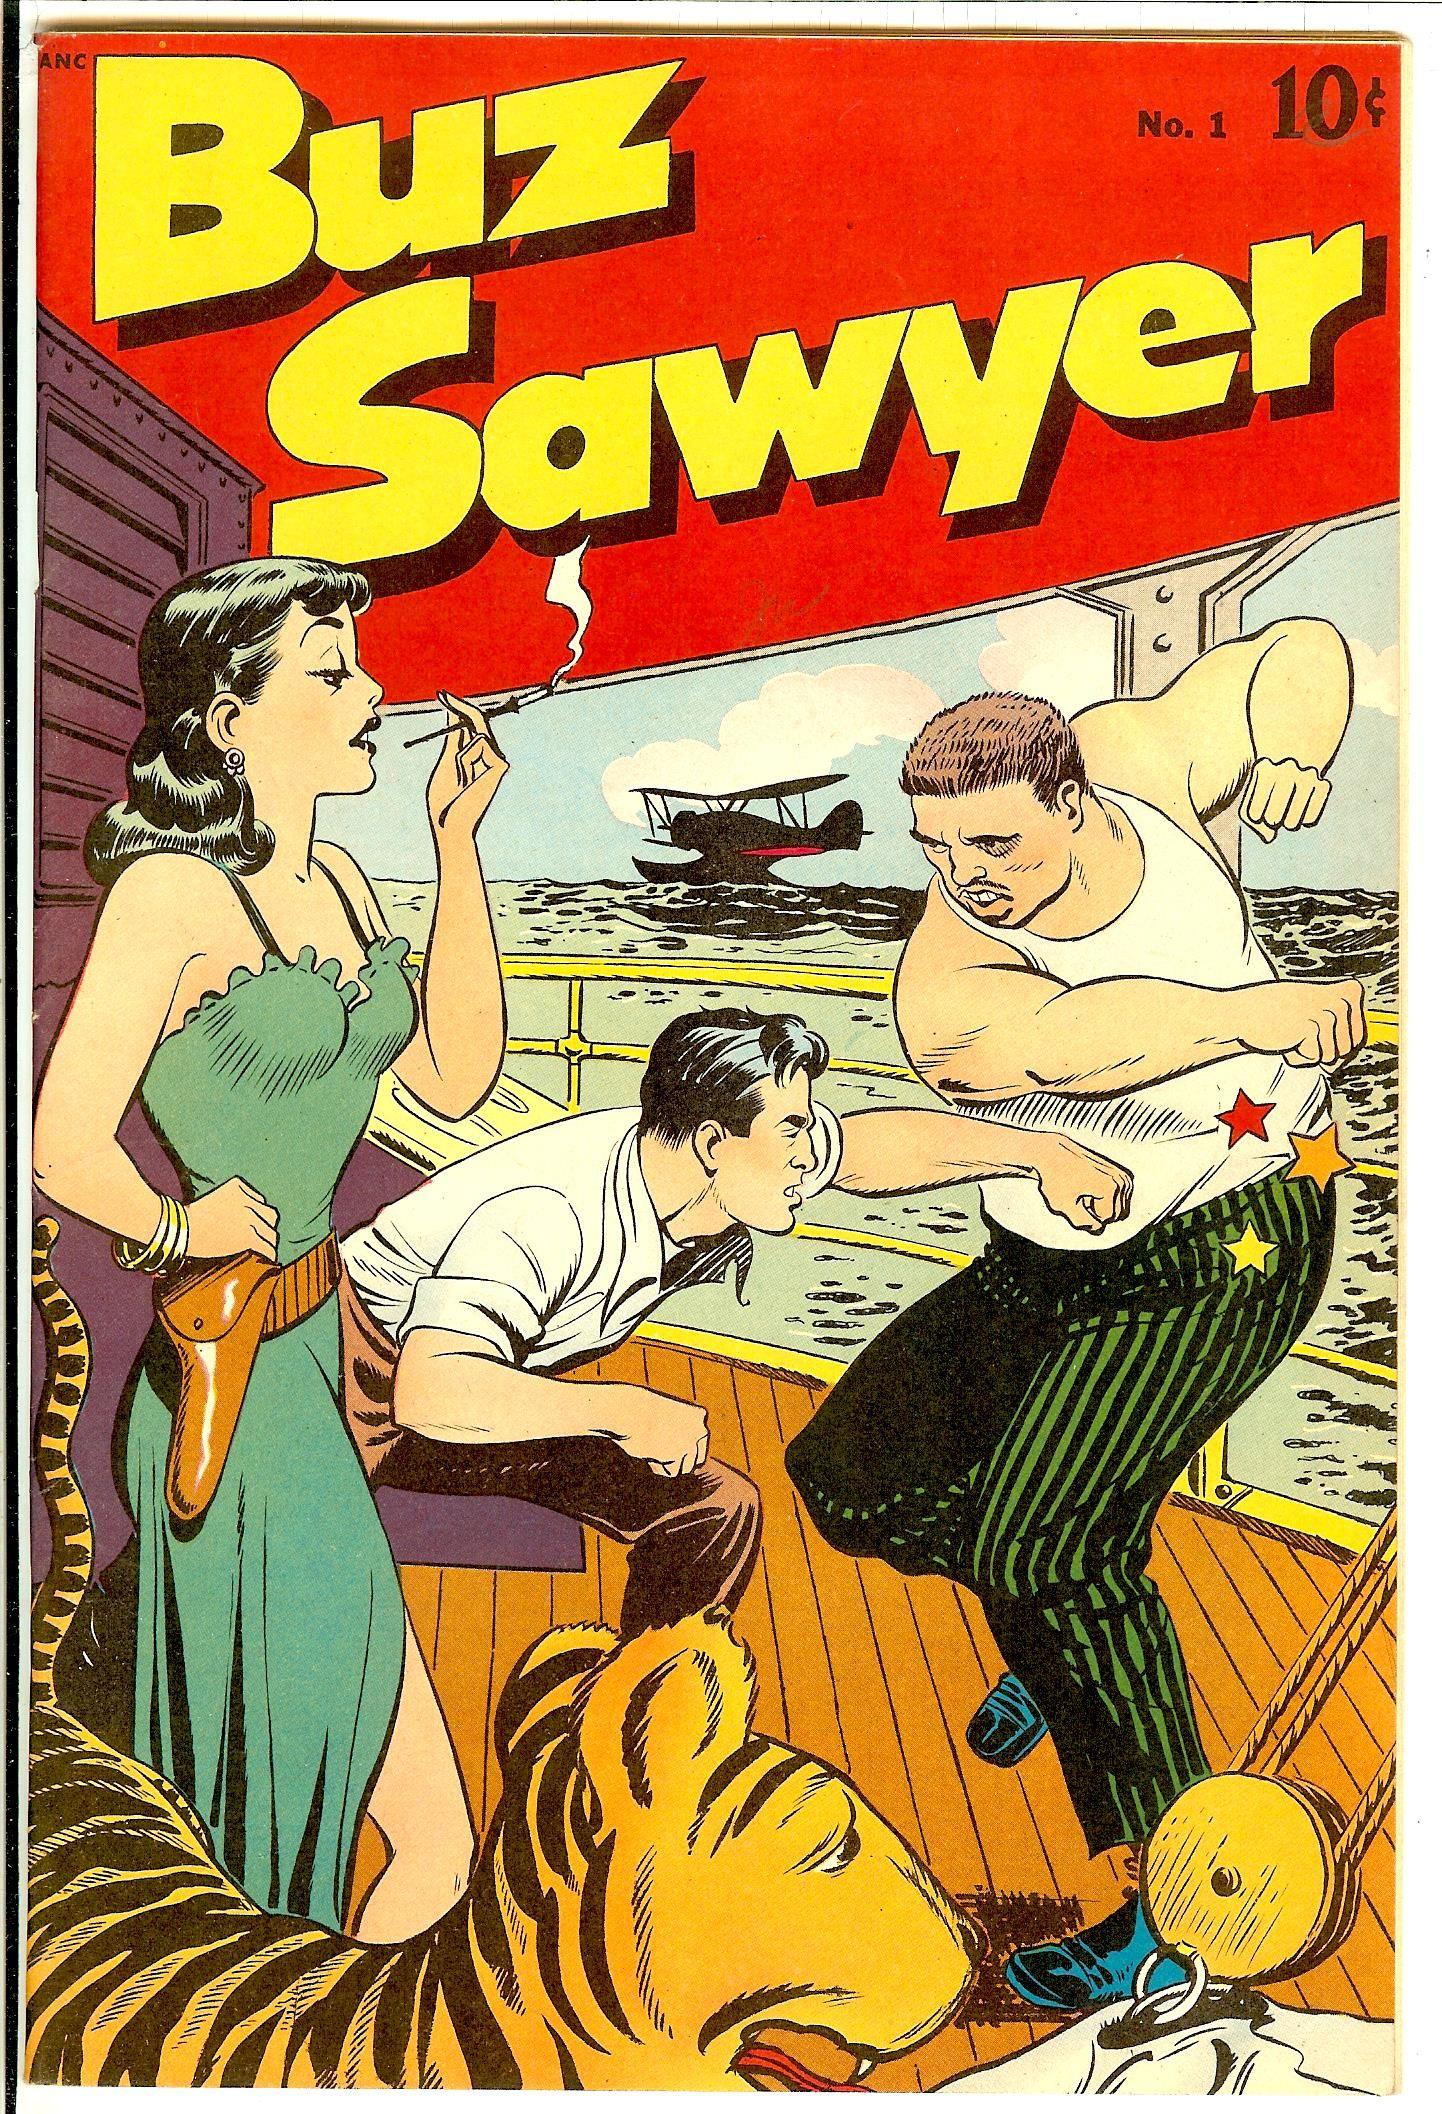 Buz Sawyer 1 Standard Pulp Fiction Comics Classic Comics Newspaper Comic Strip